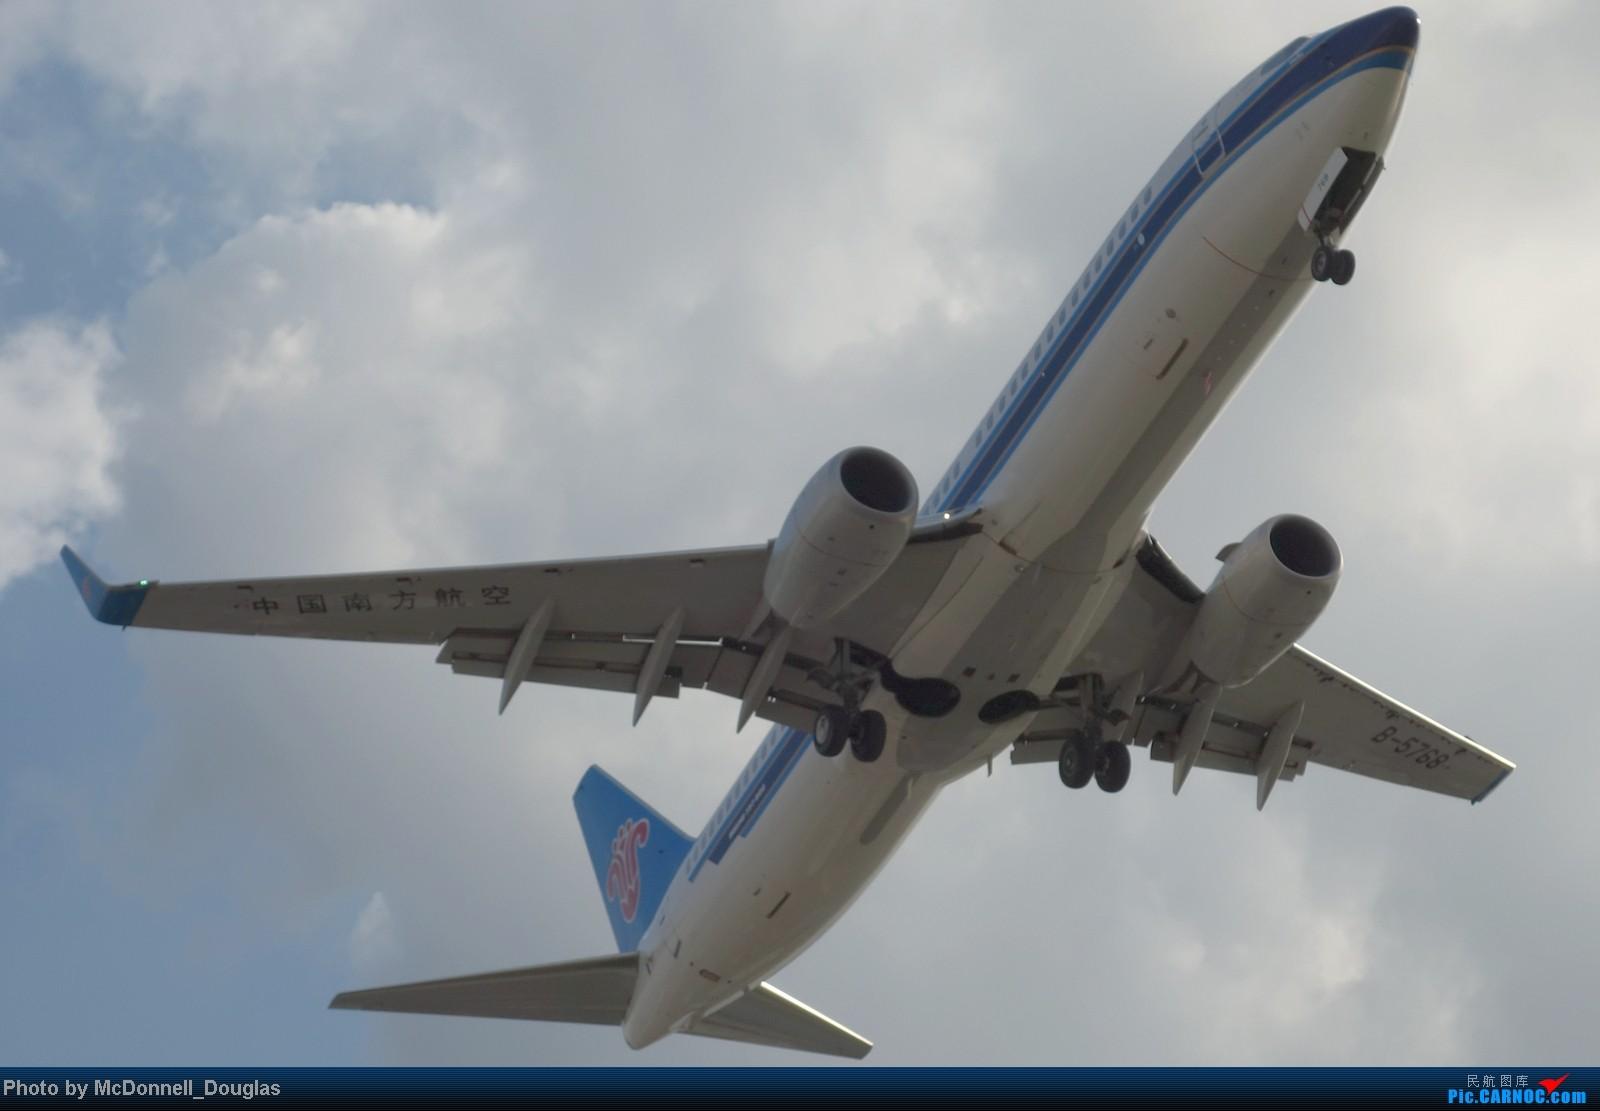 Re:[原创]【上海飞友会】ZSSS杂图一组 BOEING 737-800 B-5768 中国上海虹桥机场